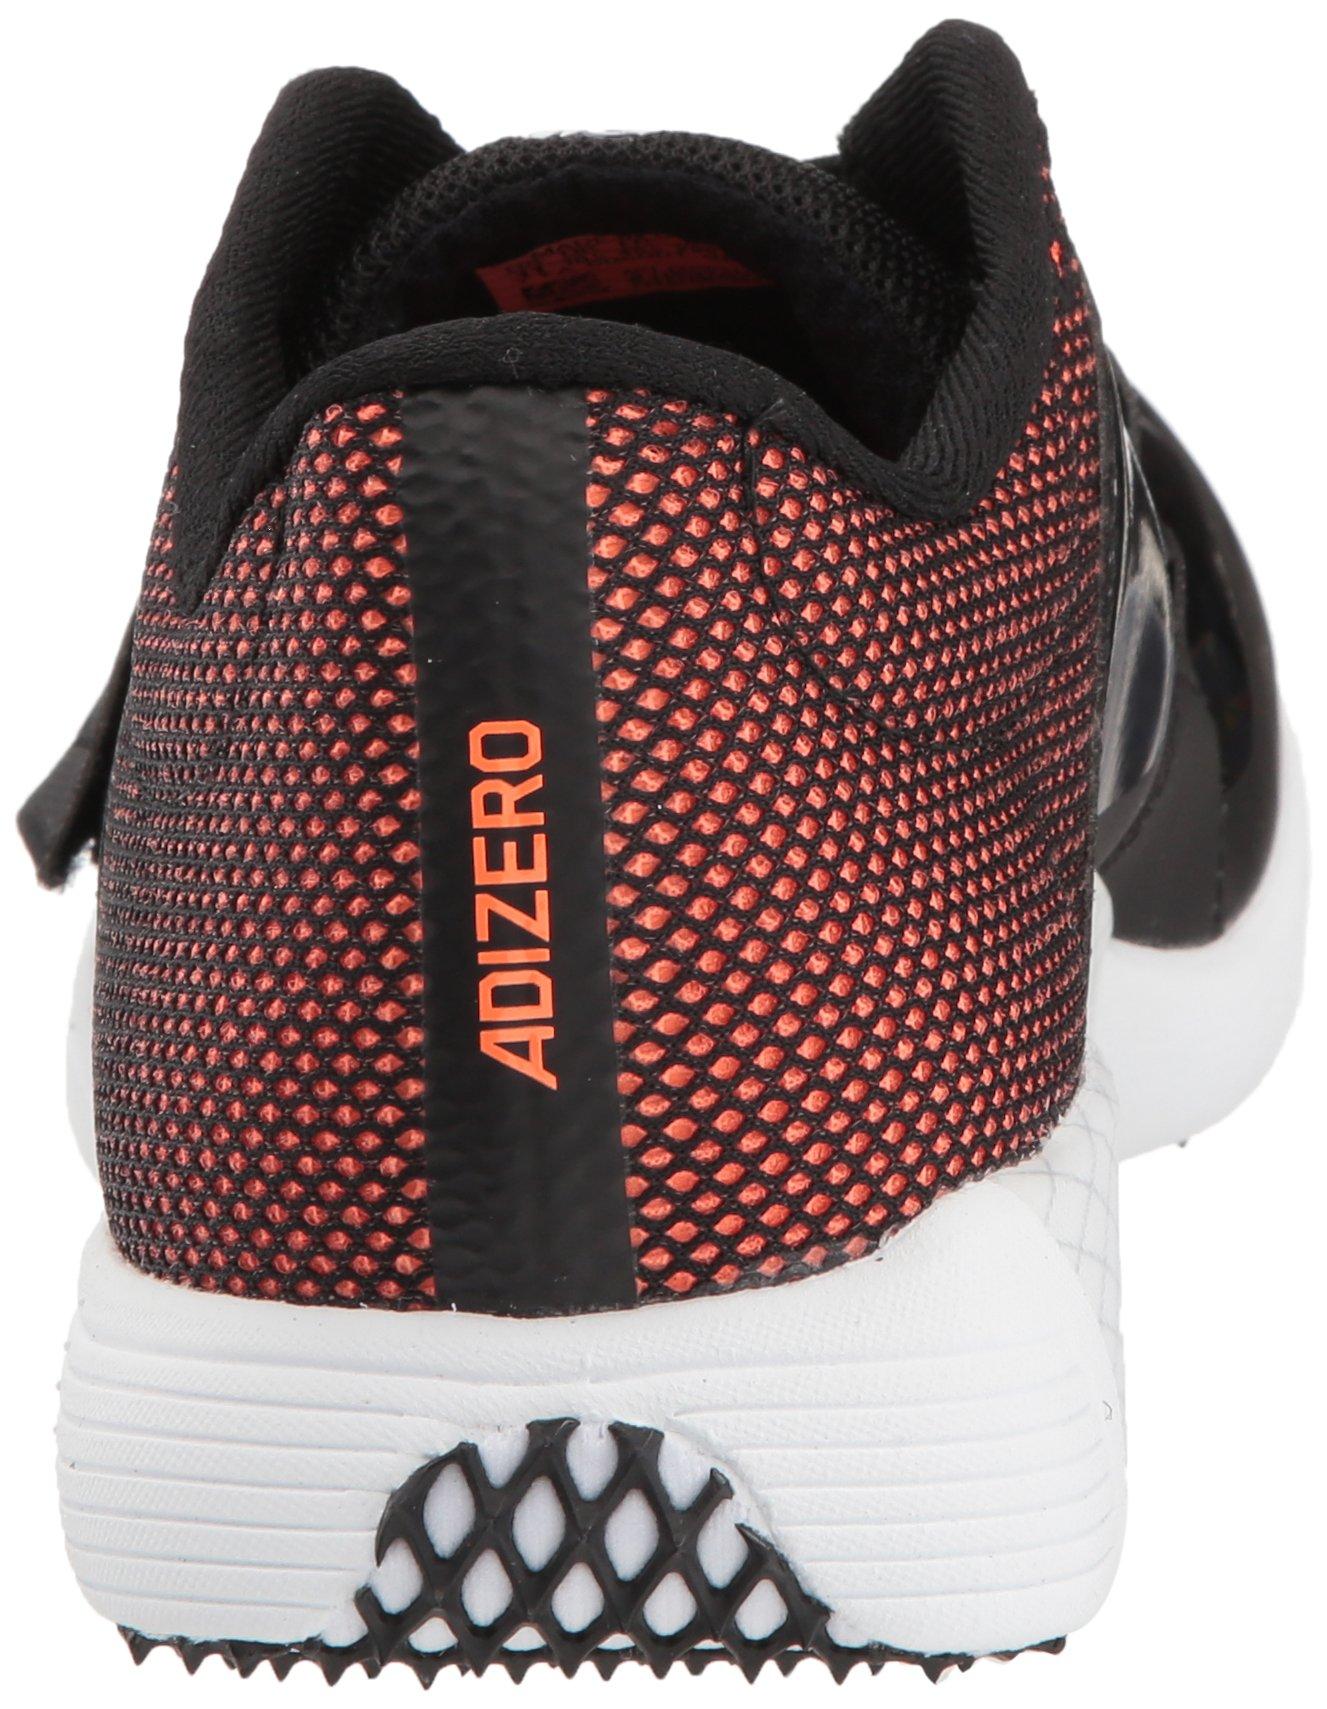 adidas Adizero tj/pv Running Shoe core Black, FTWR White, Orange 13.5 M US by adidas (Image #2)